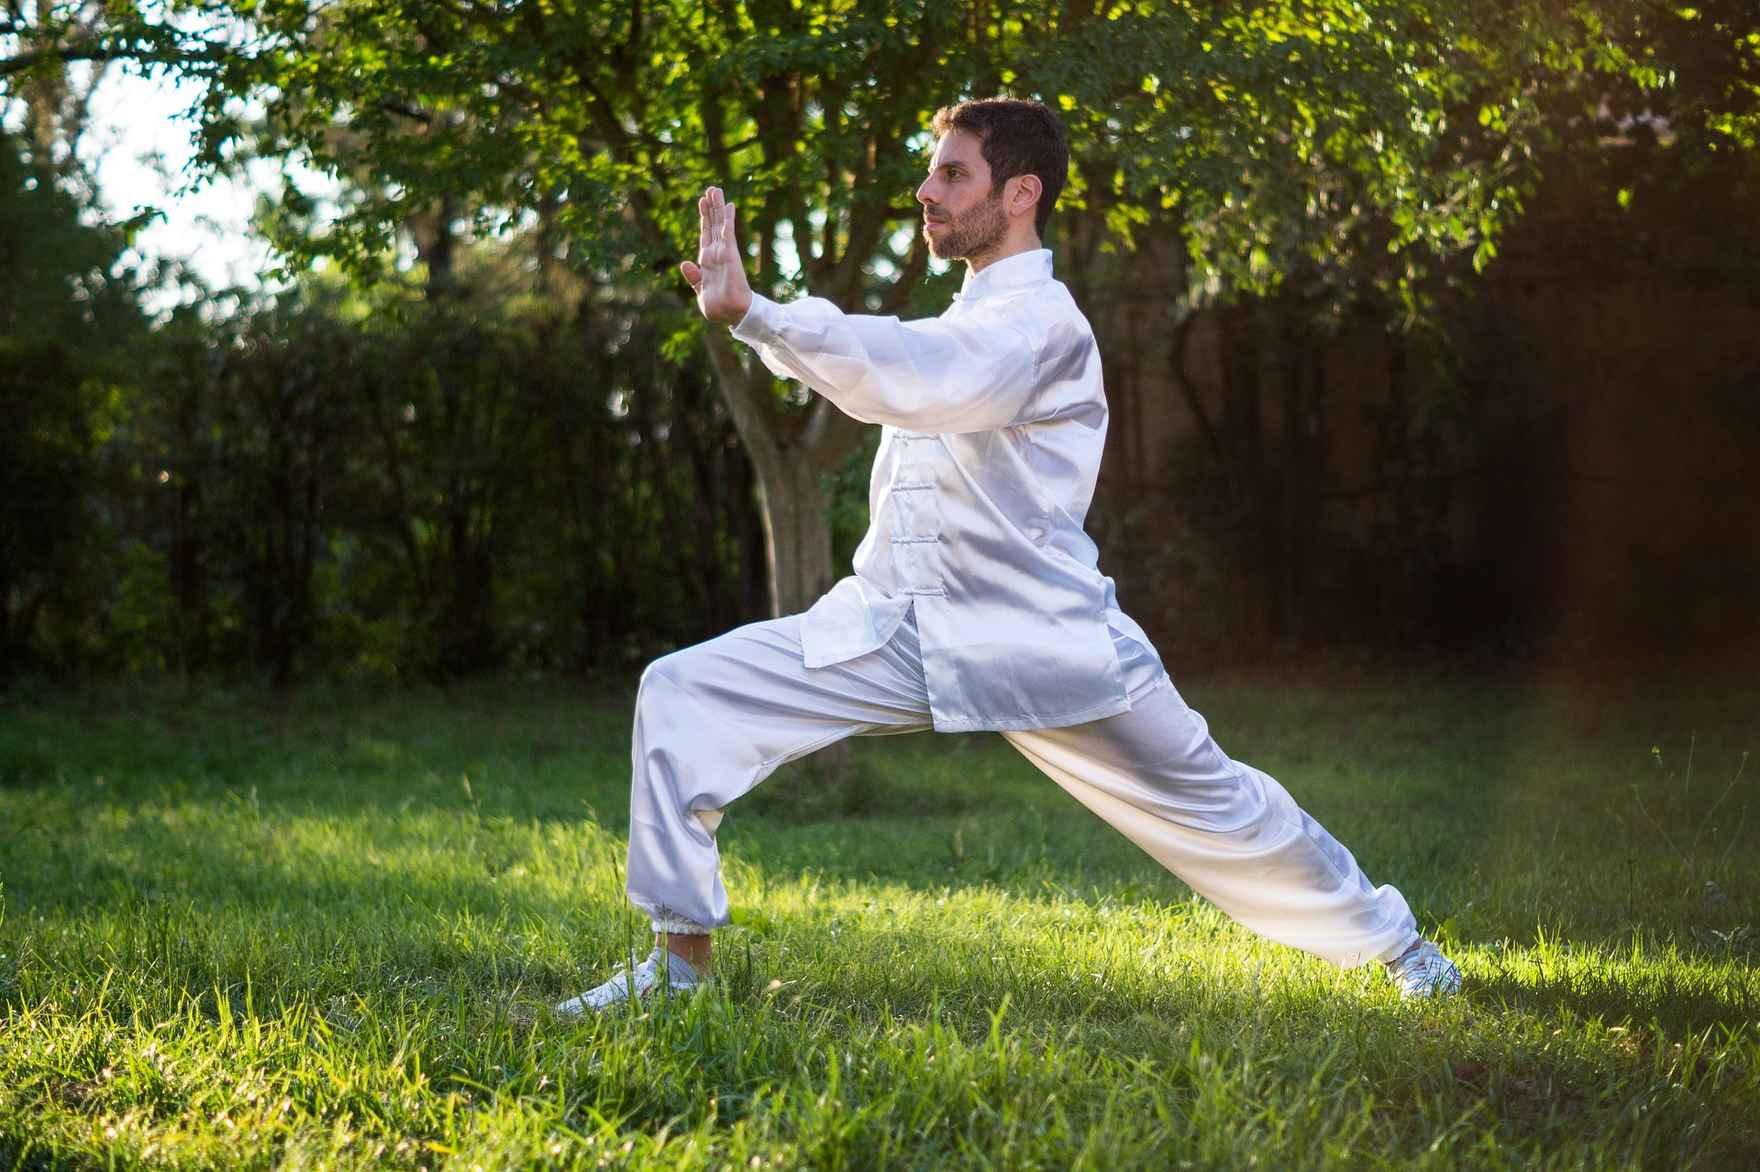 qi gong tai qi chi nature man energy health